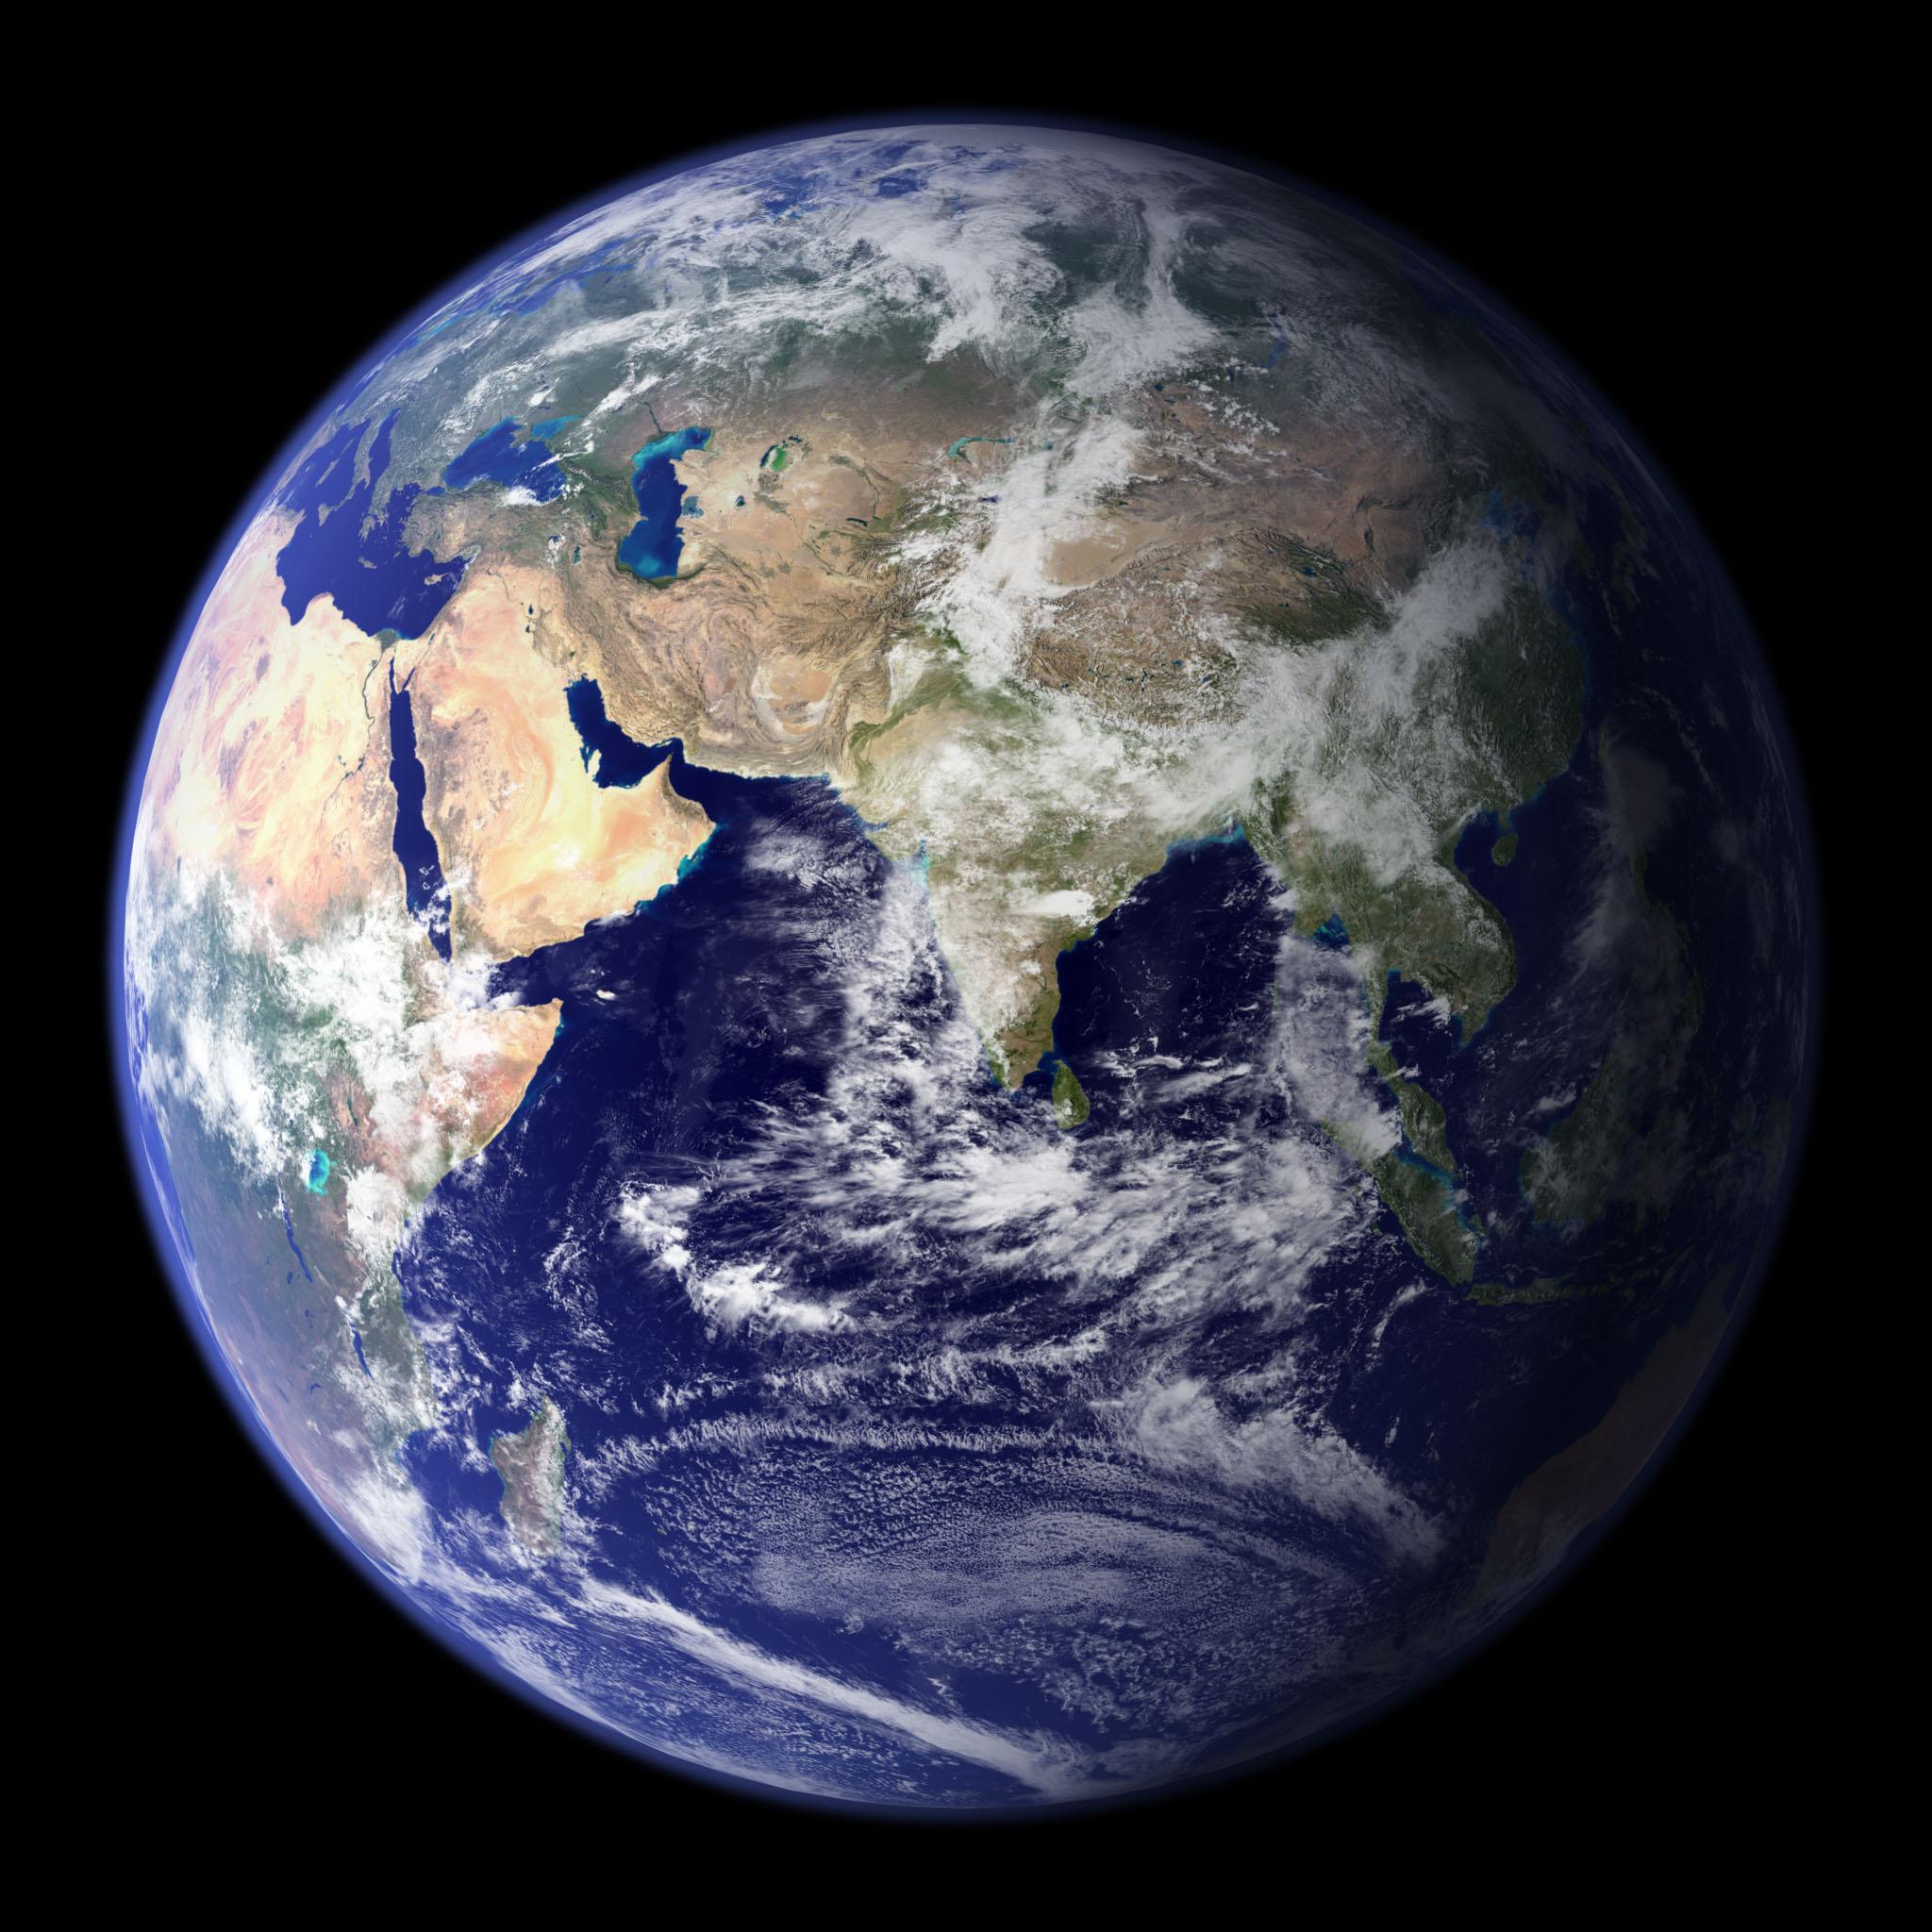 NASA Visible Earth The Blue Marble 2048x2048